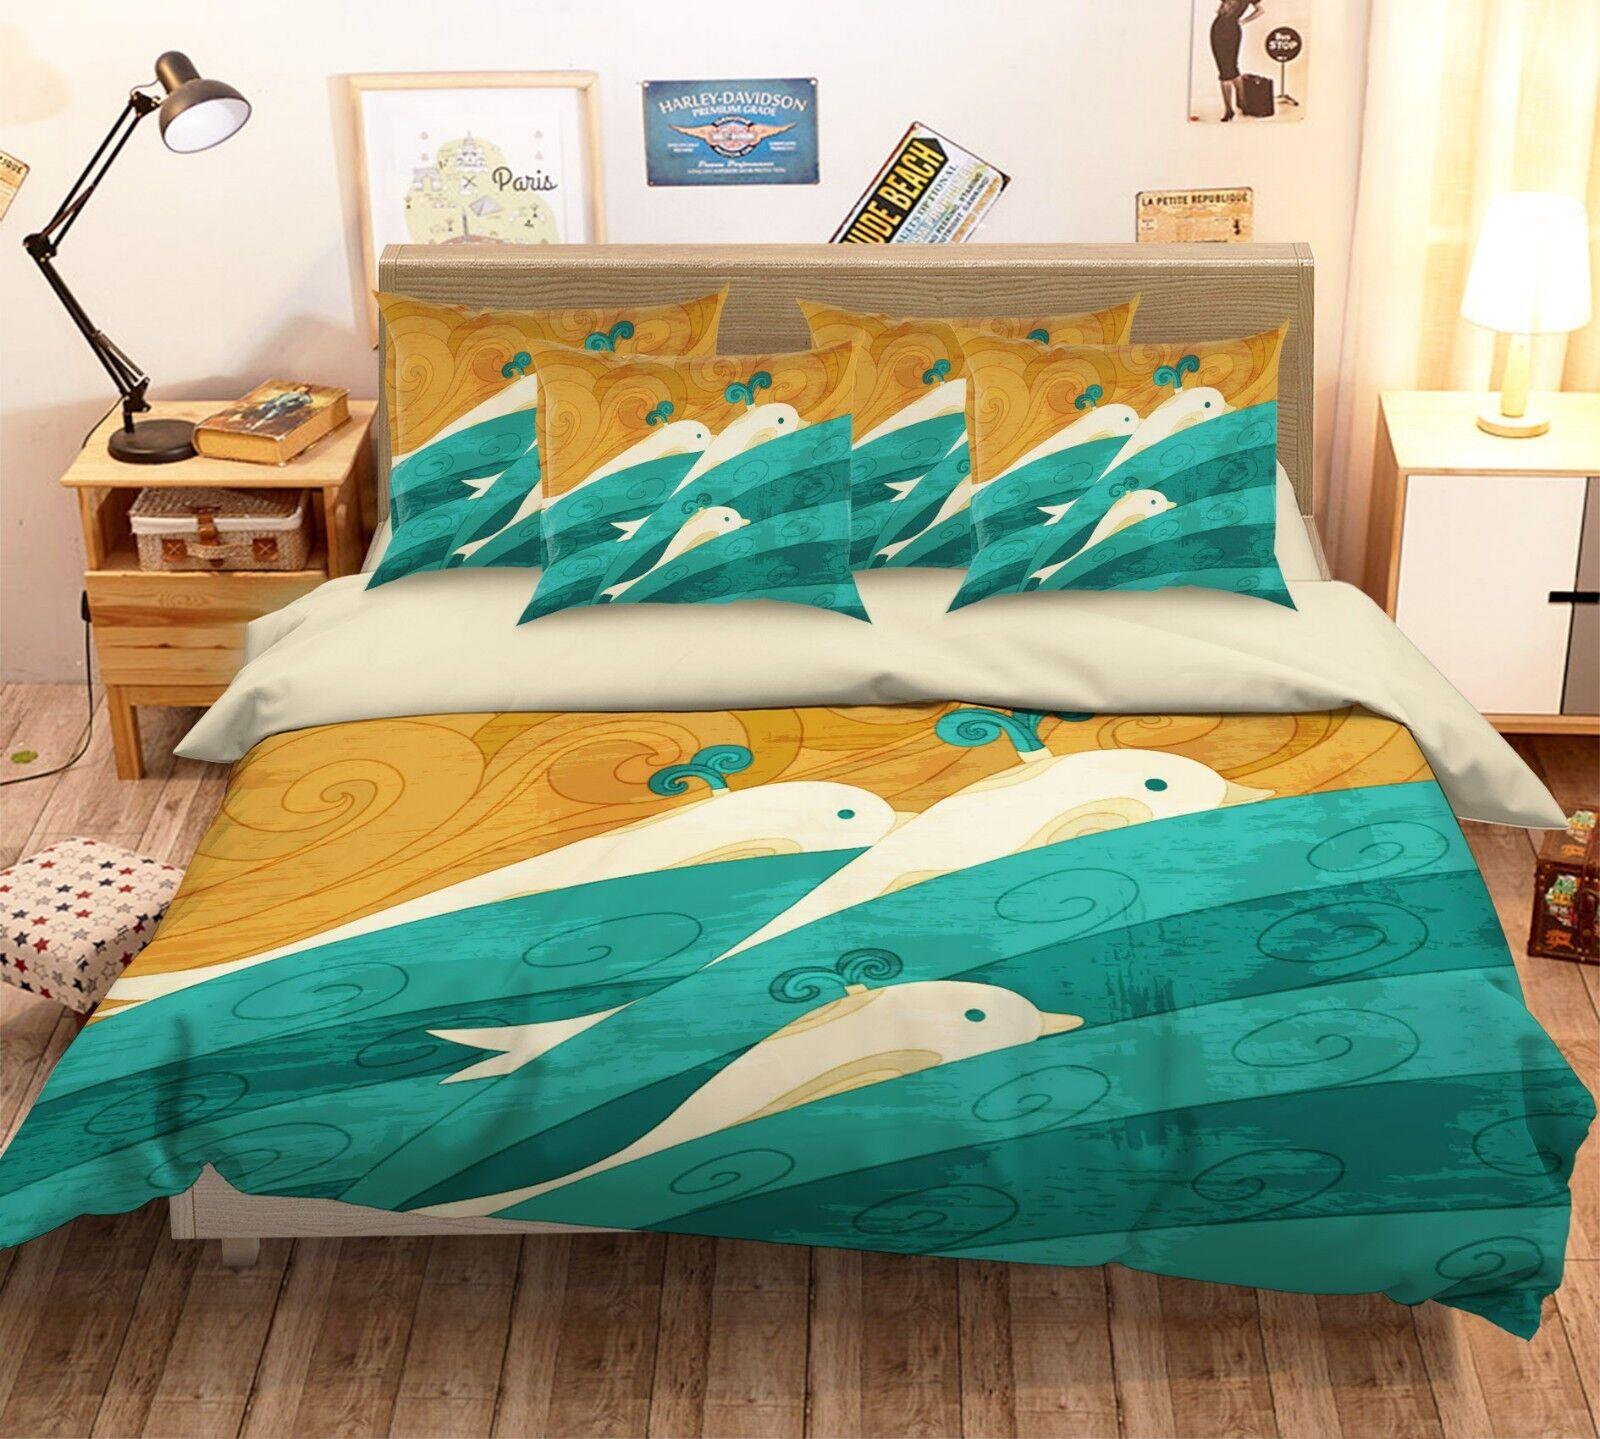 3D Whale blueeeeee Wave 26 Bed Pillowcases Quilt Duvet Single Queen King US Summer